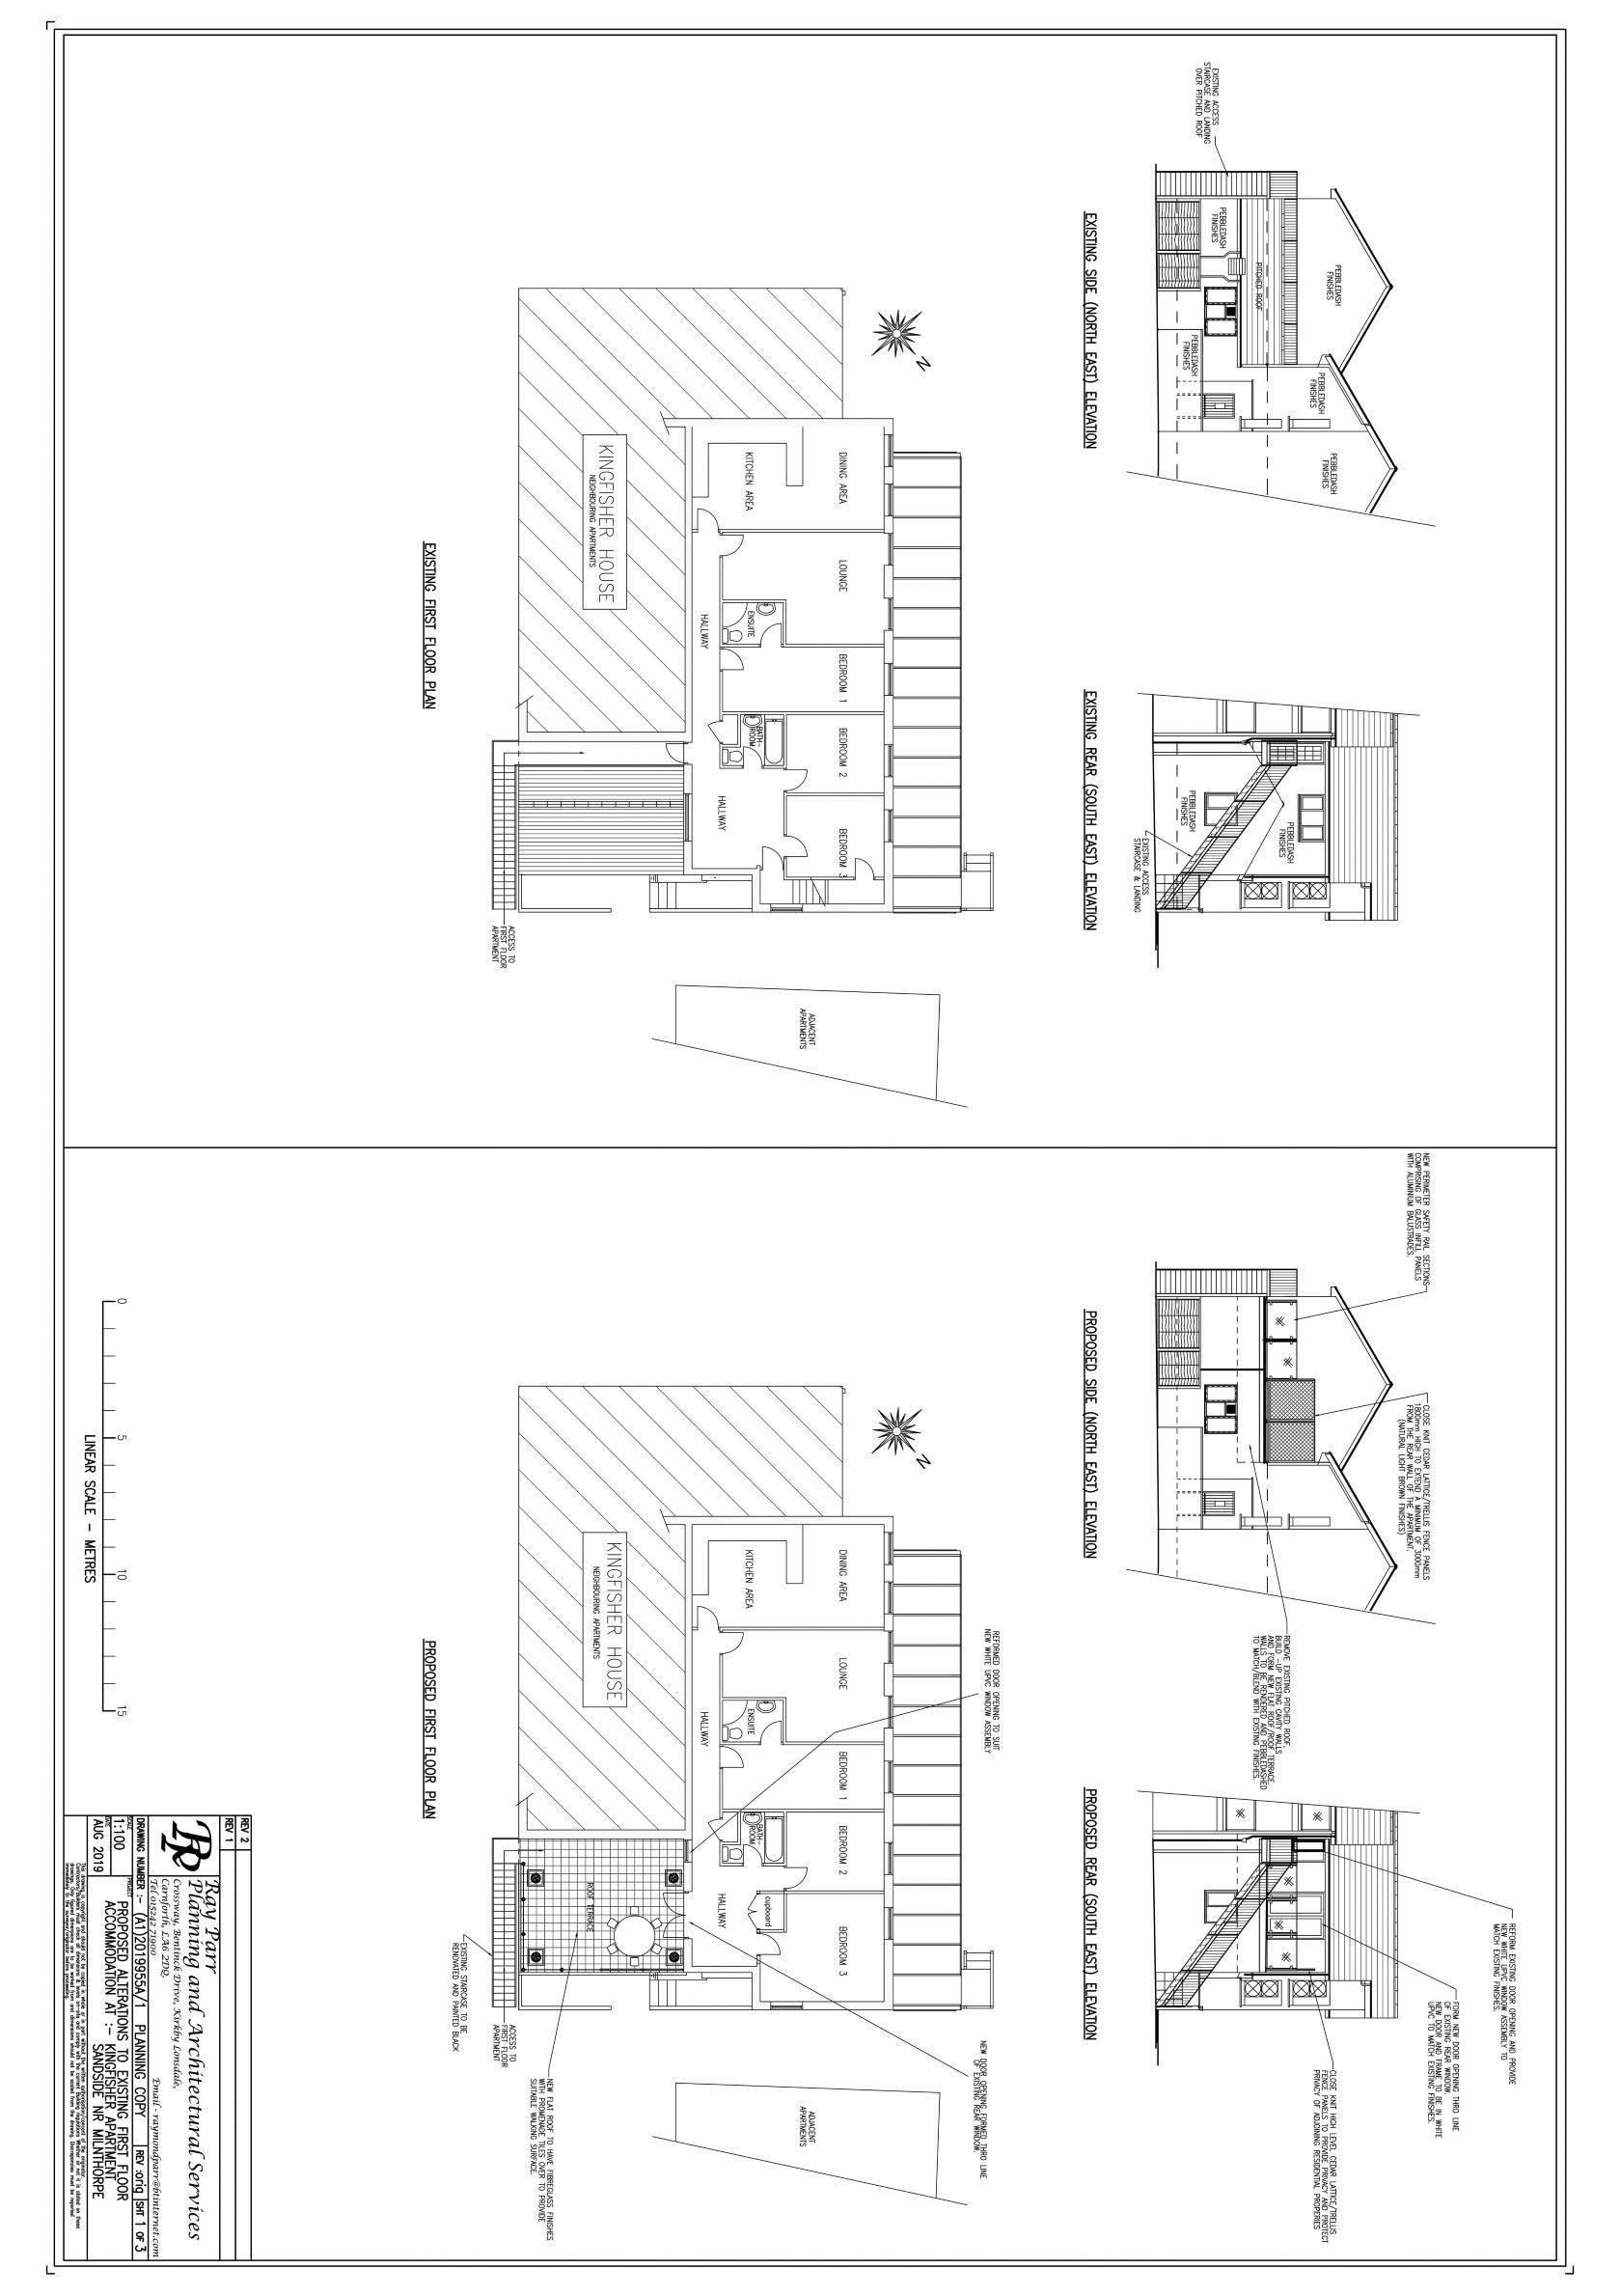 1st floor apartment layout